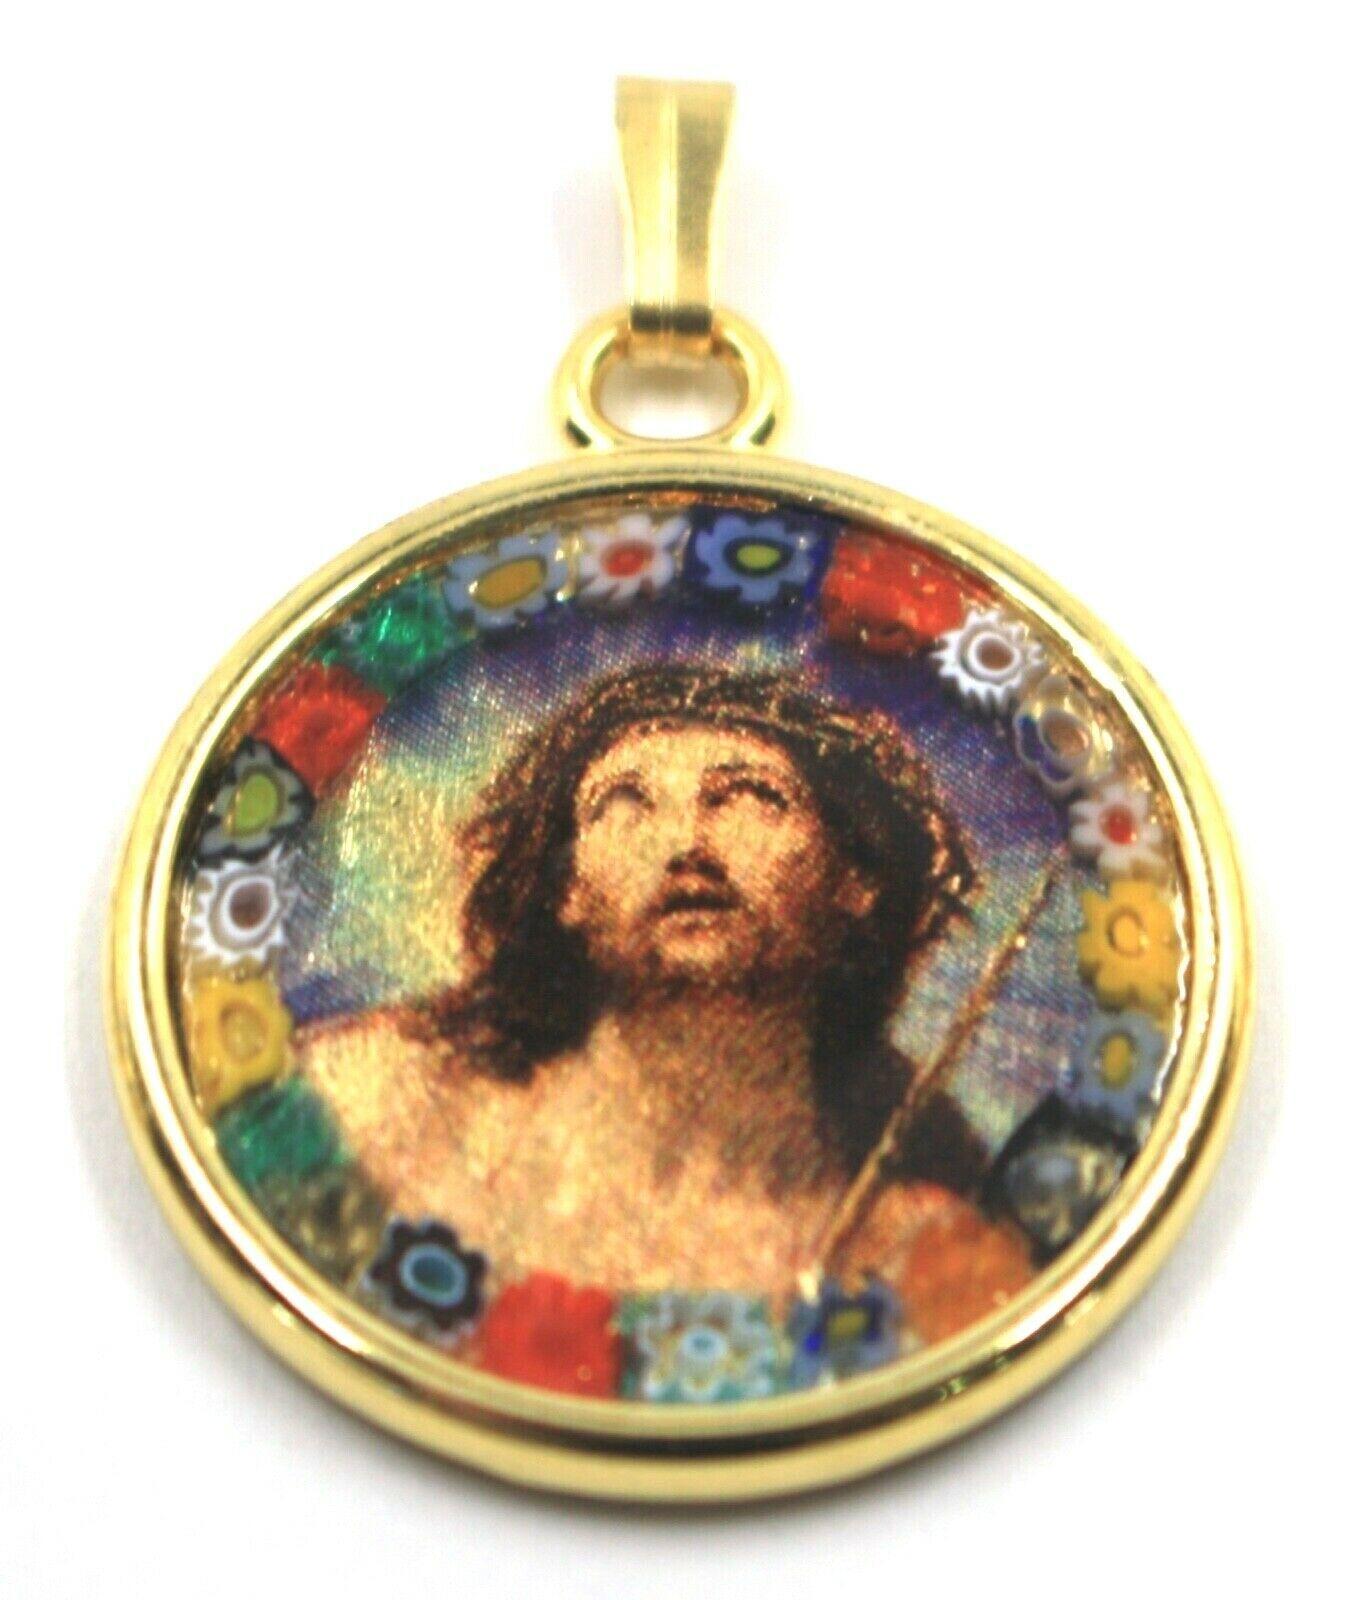 "MURANO GLASS ROUND MEDAL PENDANT, JESUS FACE, 25mm 1"" FLOWER FRAME GOLD LEAF"